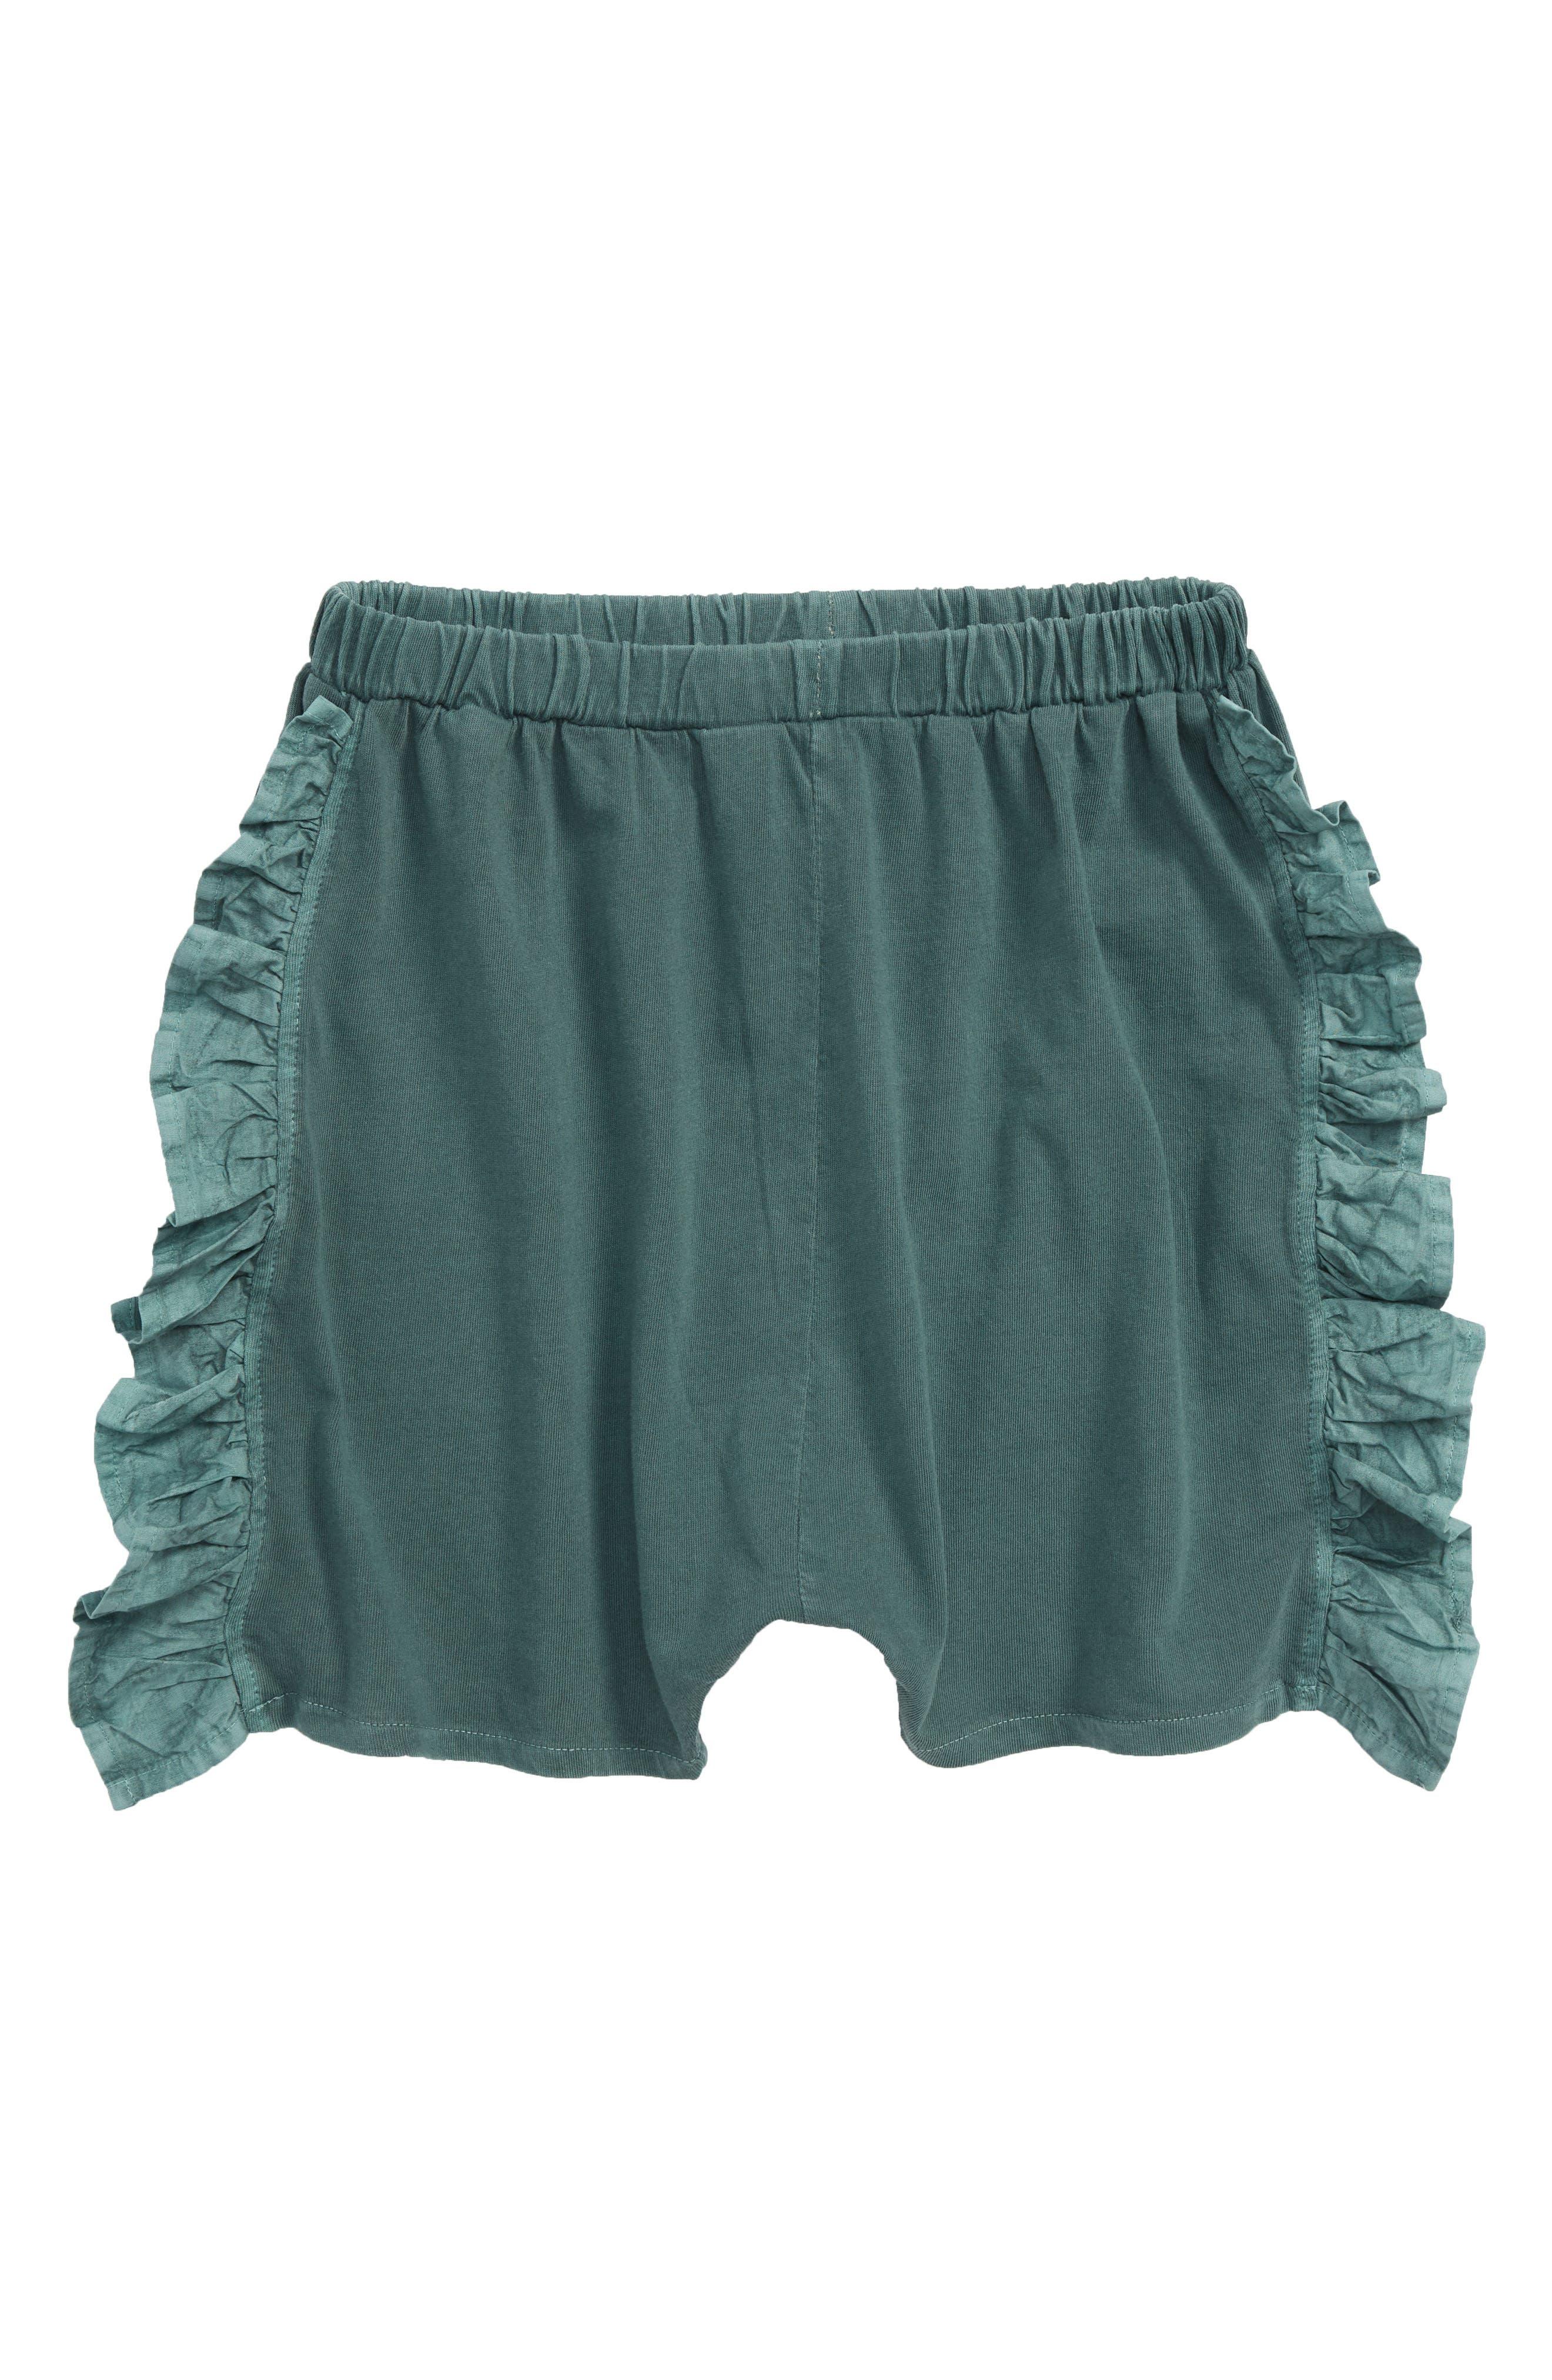 Ruffle Knit Short,                         Main,                         color, Green Agave